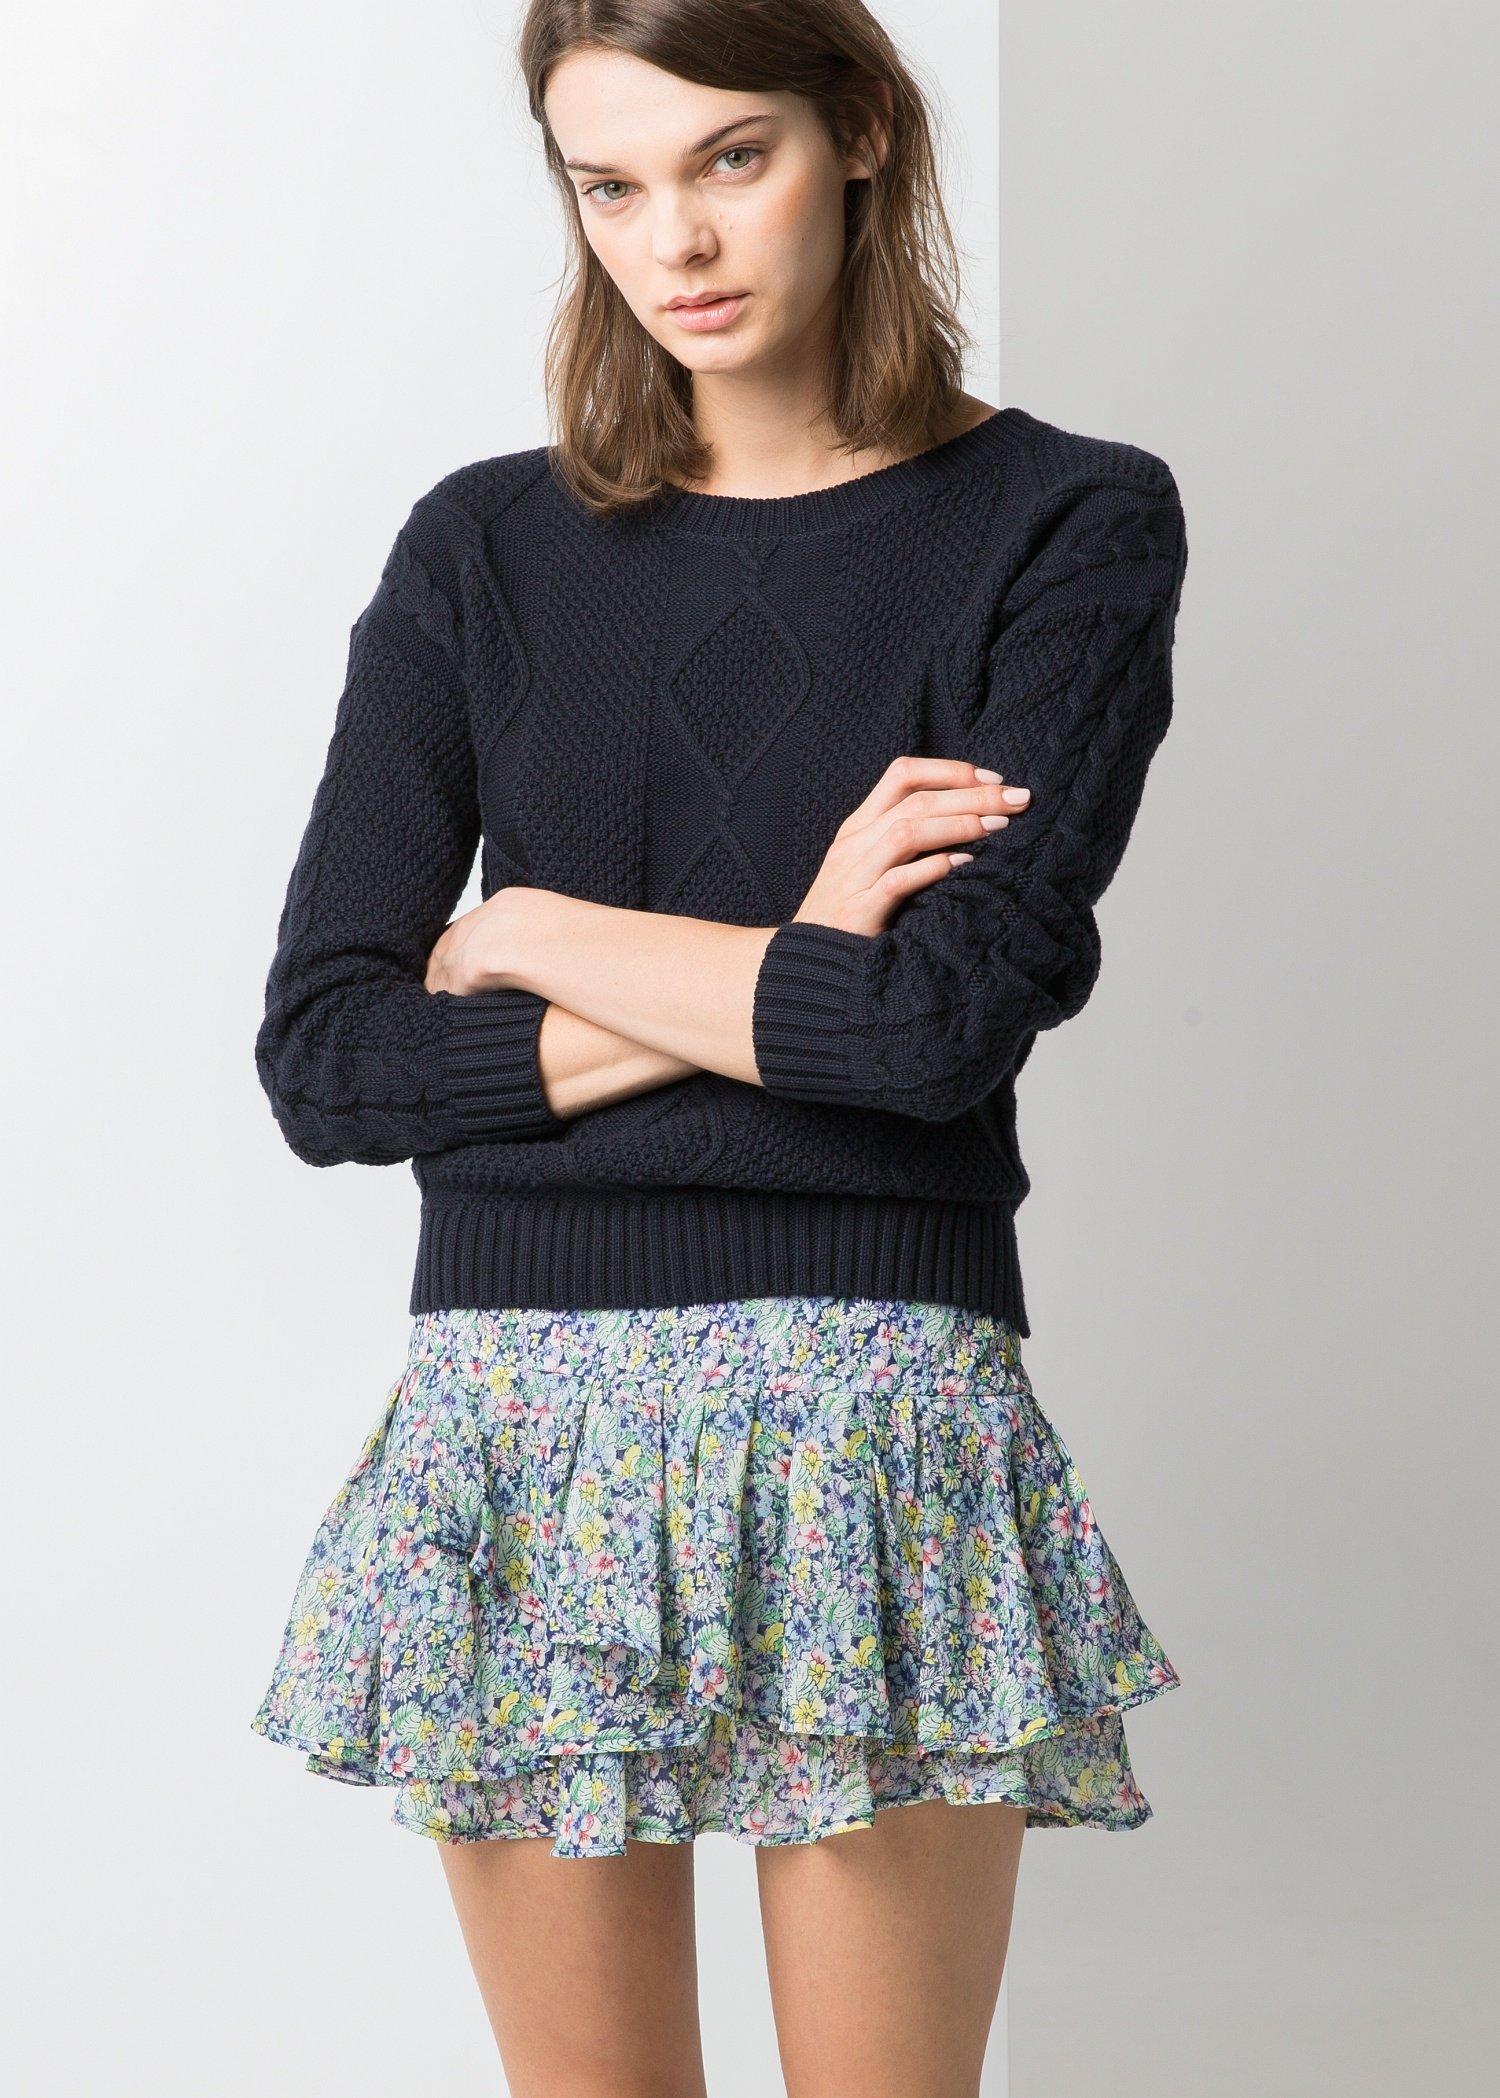 Mango Ruffled Floral Mini Skirt | Lyst